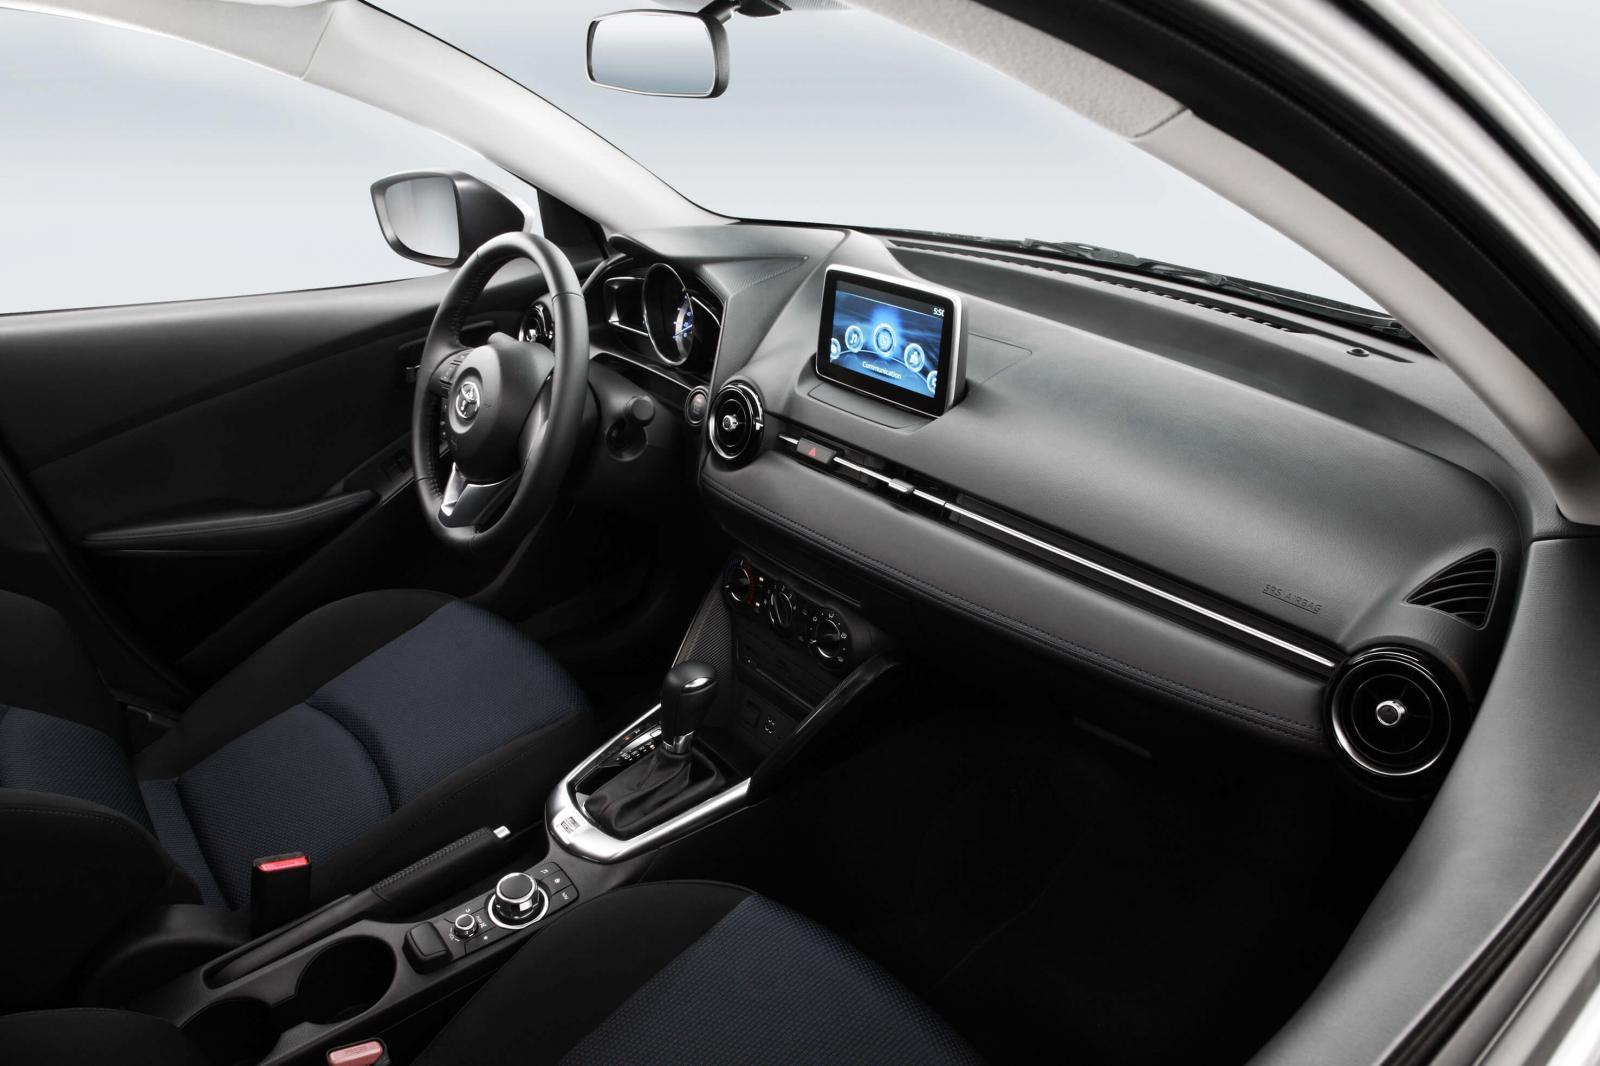 Toyota Yaris R 2019 XLE vs Mazda 2 Sedán 2019 i Grand Touring